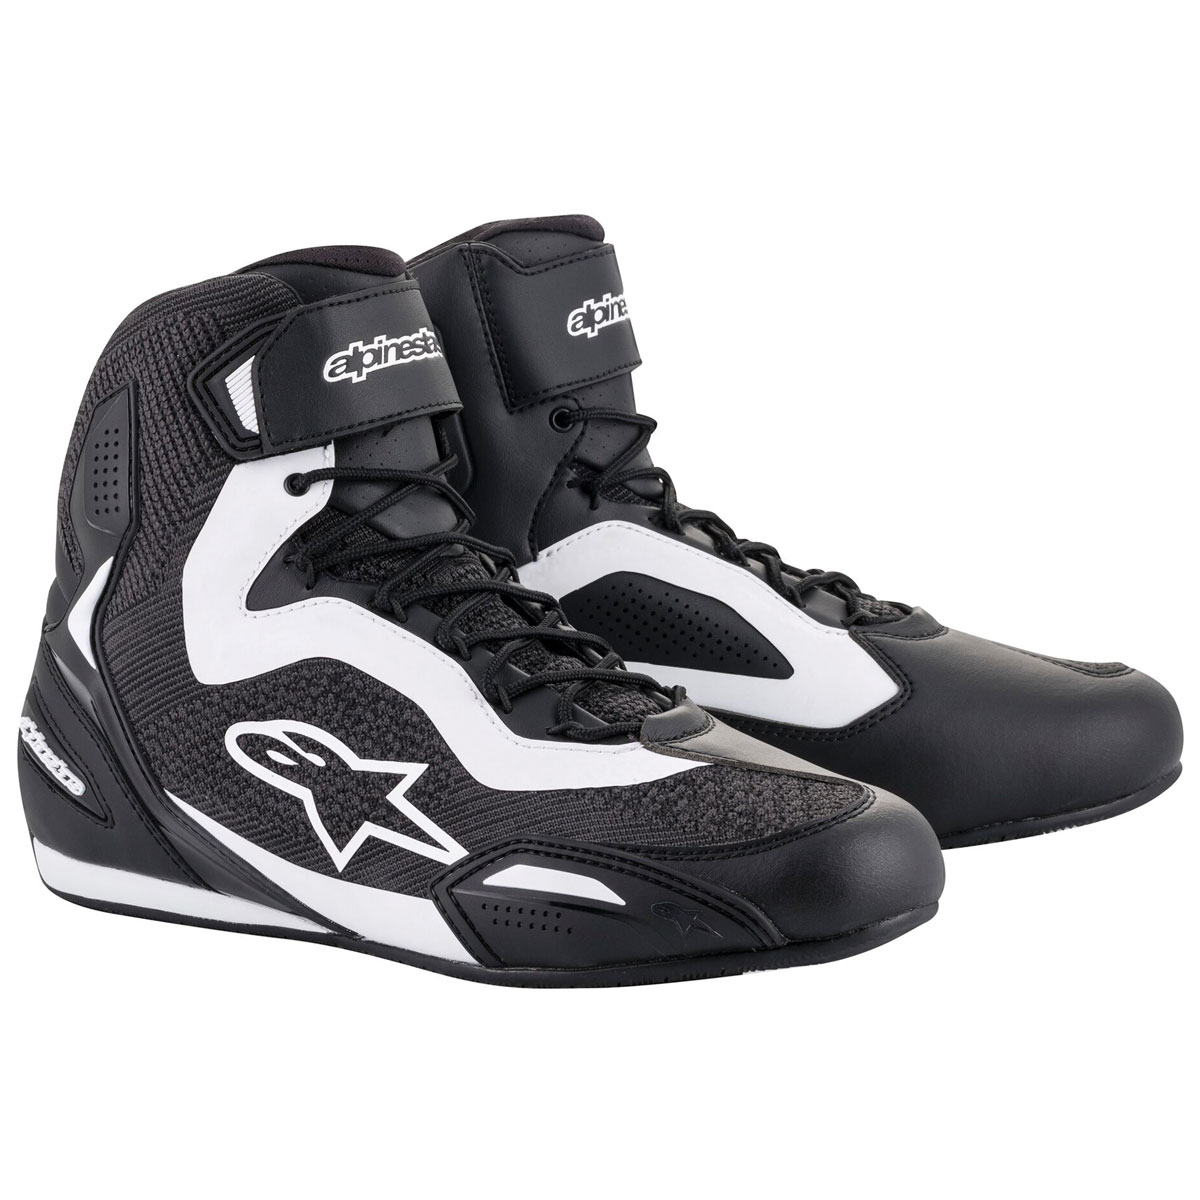 Alpinestars Men's Faster-3 Rideknit Black/White Shoes